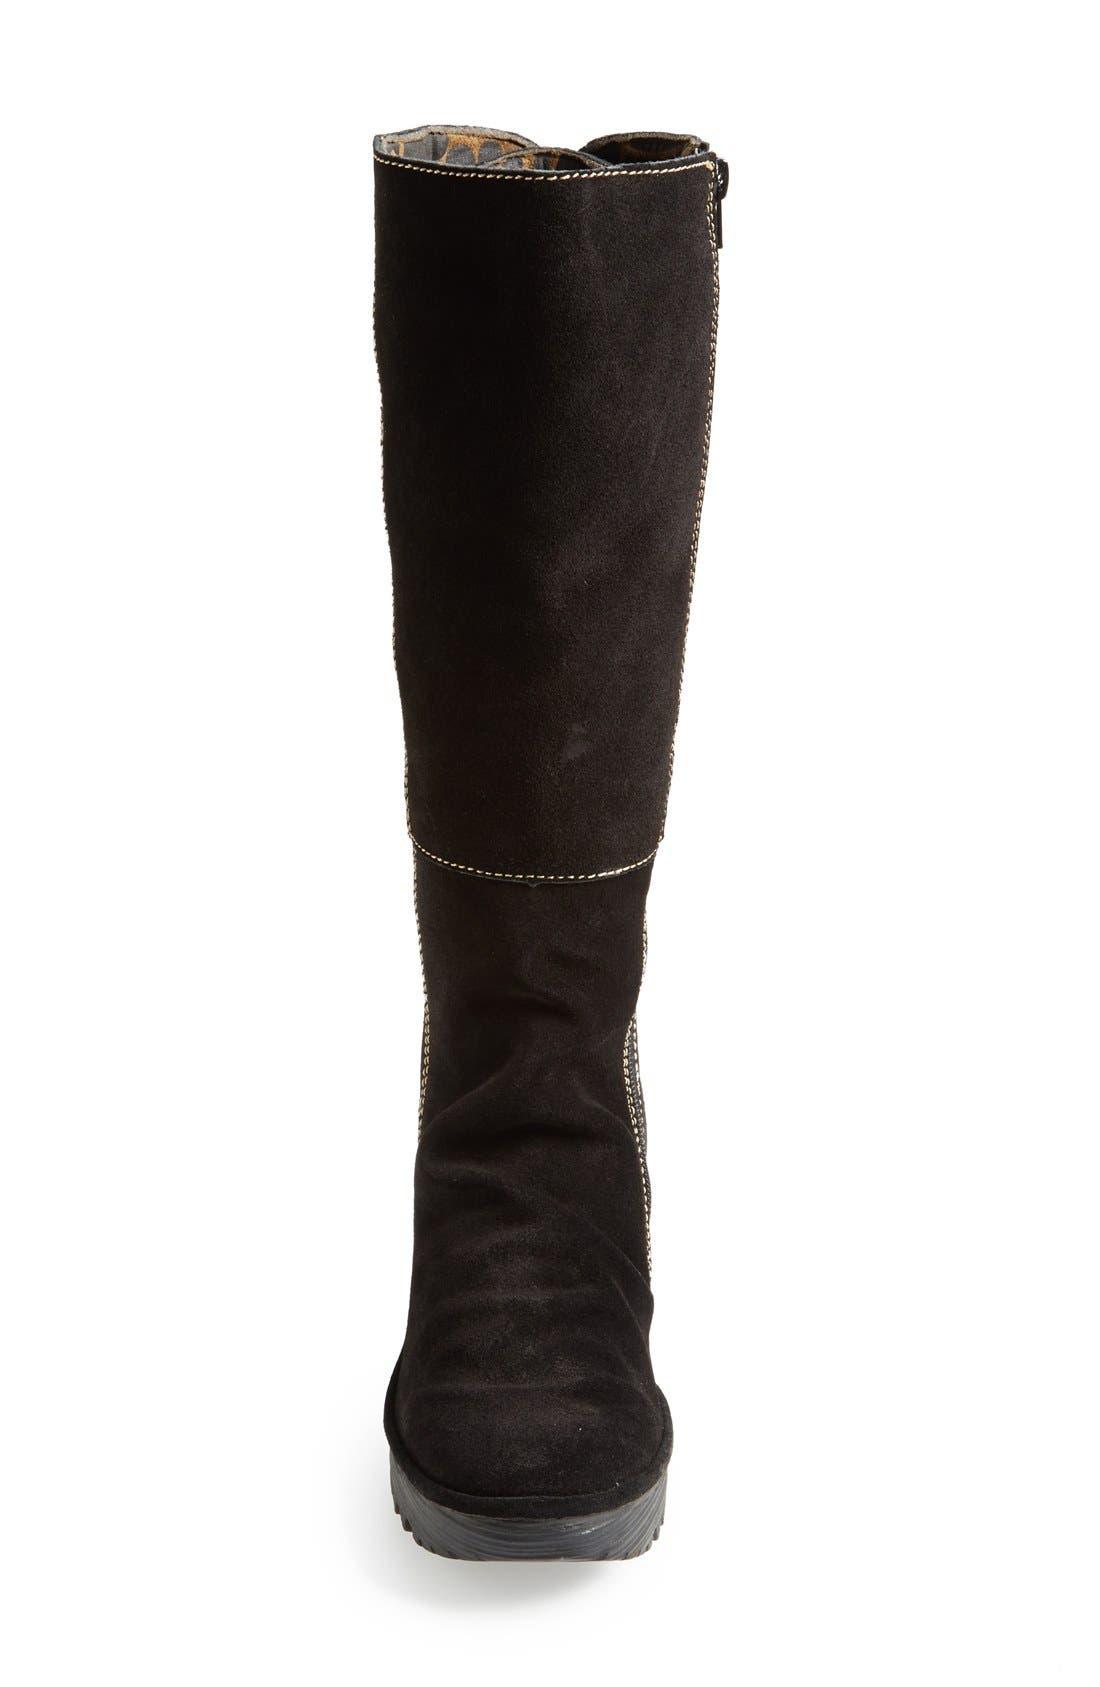 Alternate Image 3  - Fly London 'Yust' Knee High Platform Wedge Boot (Women)